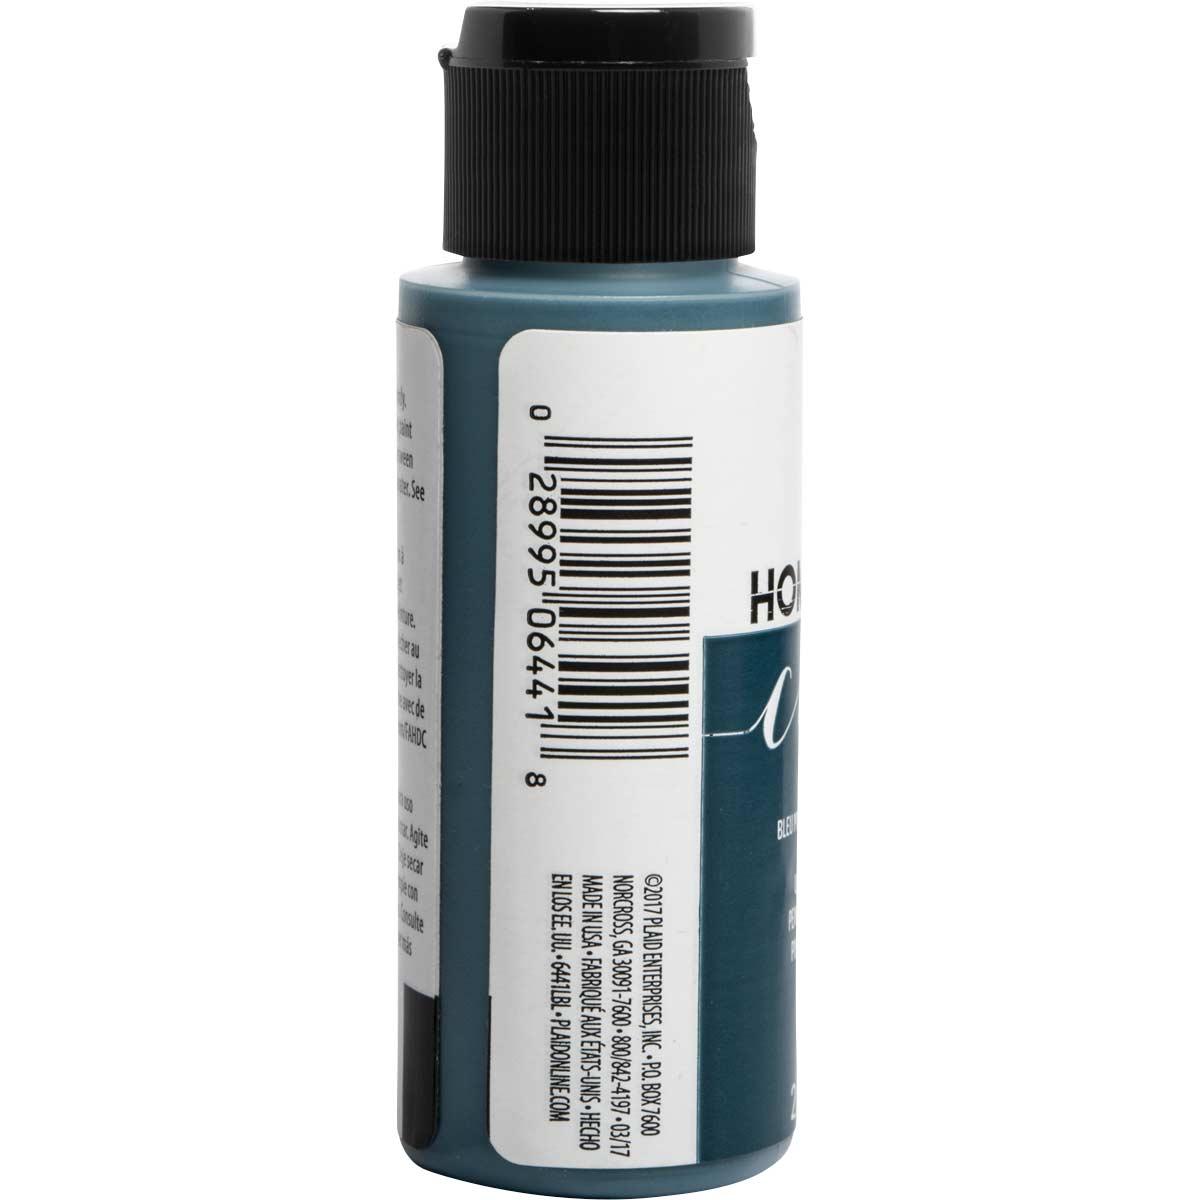 FolkArt ® Home Decor™ Chalk - Turkish Tile, 2 oz. - 6441